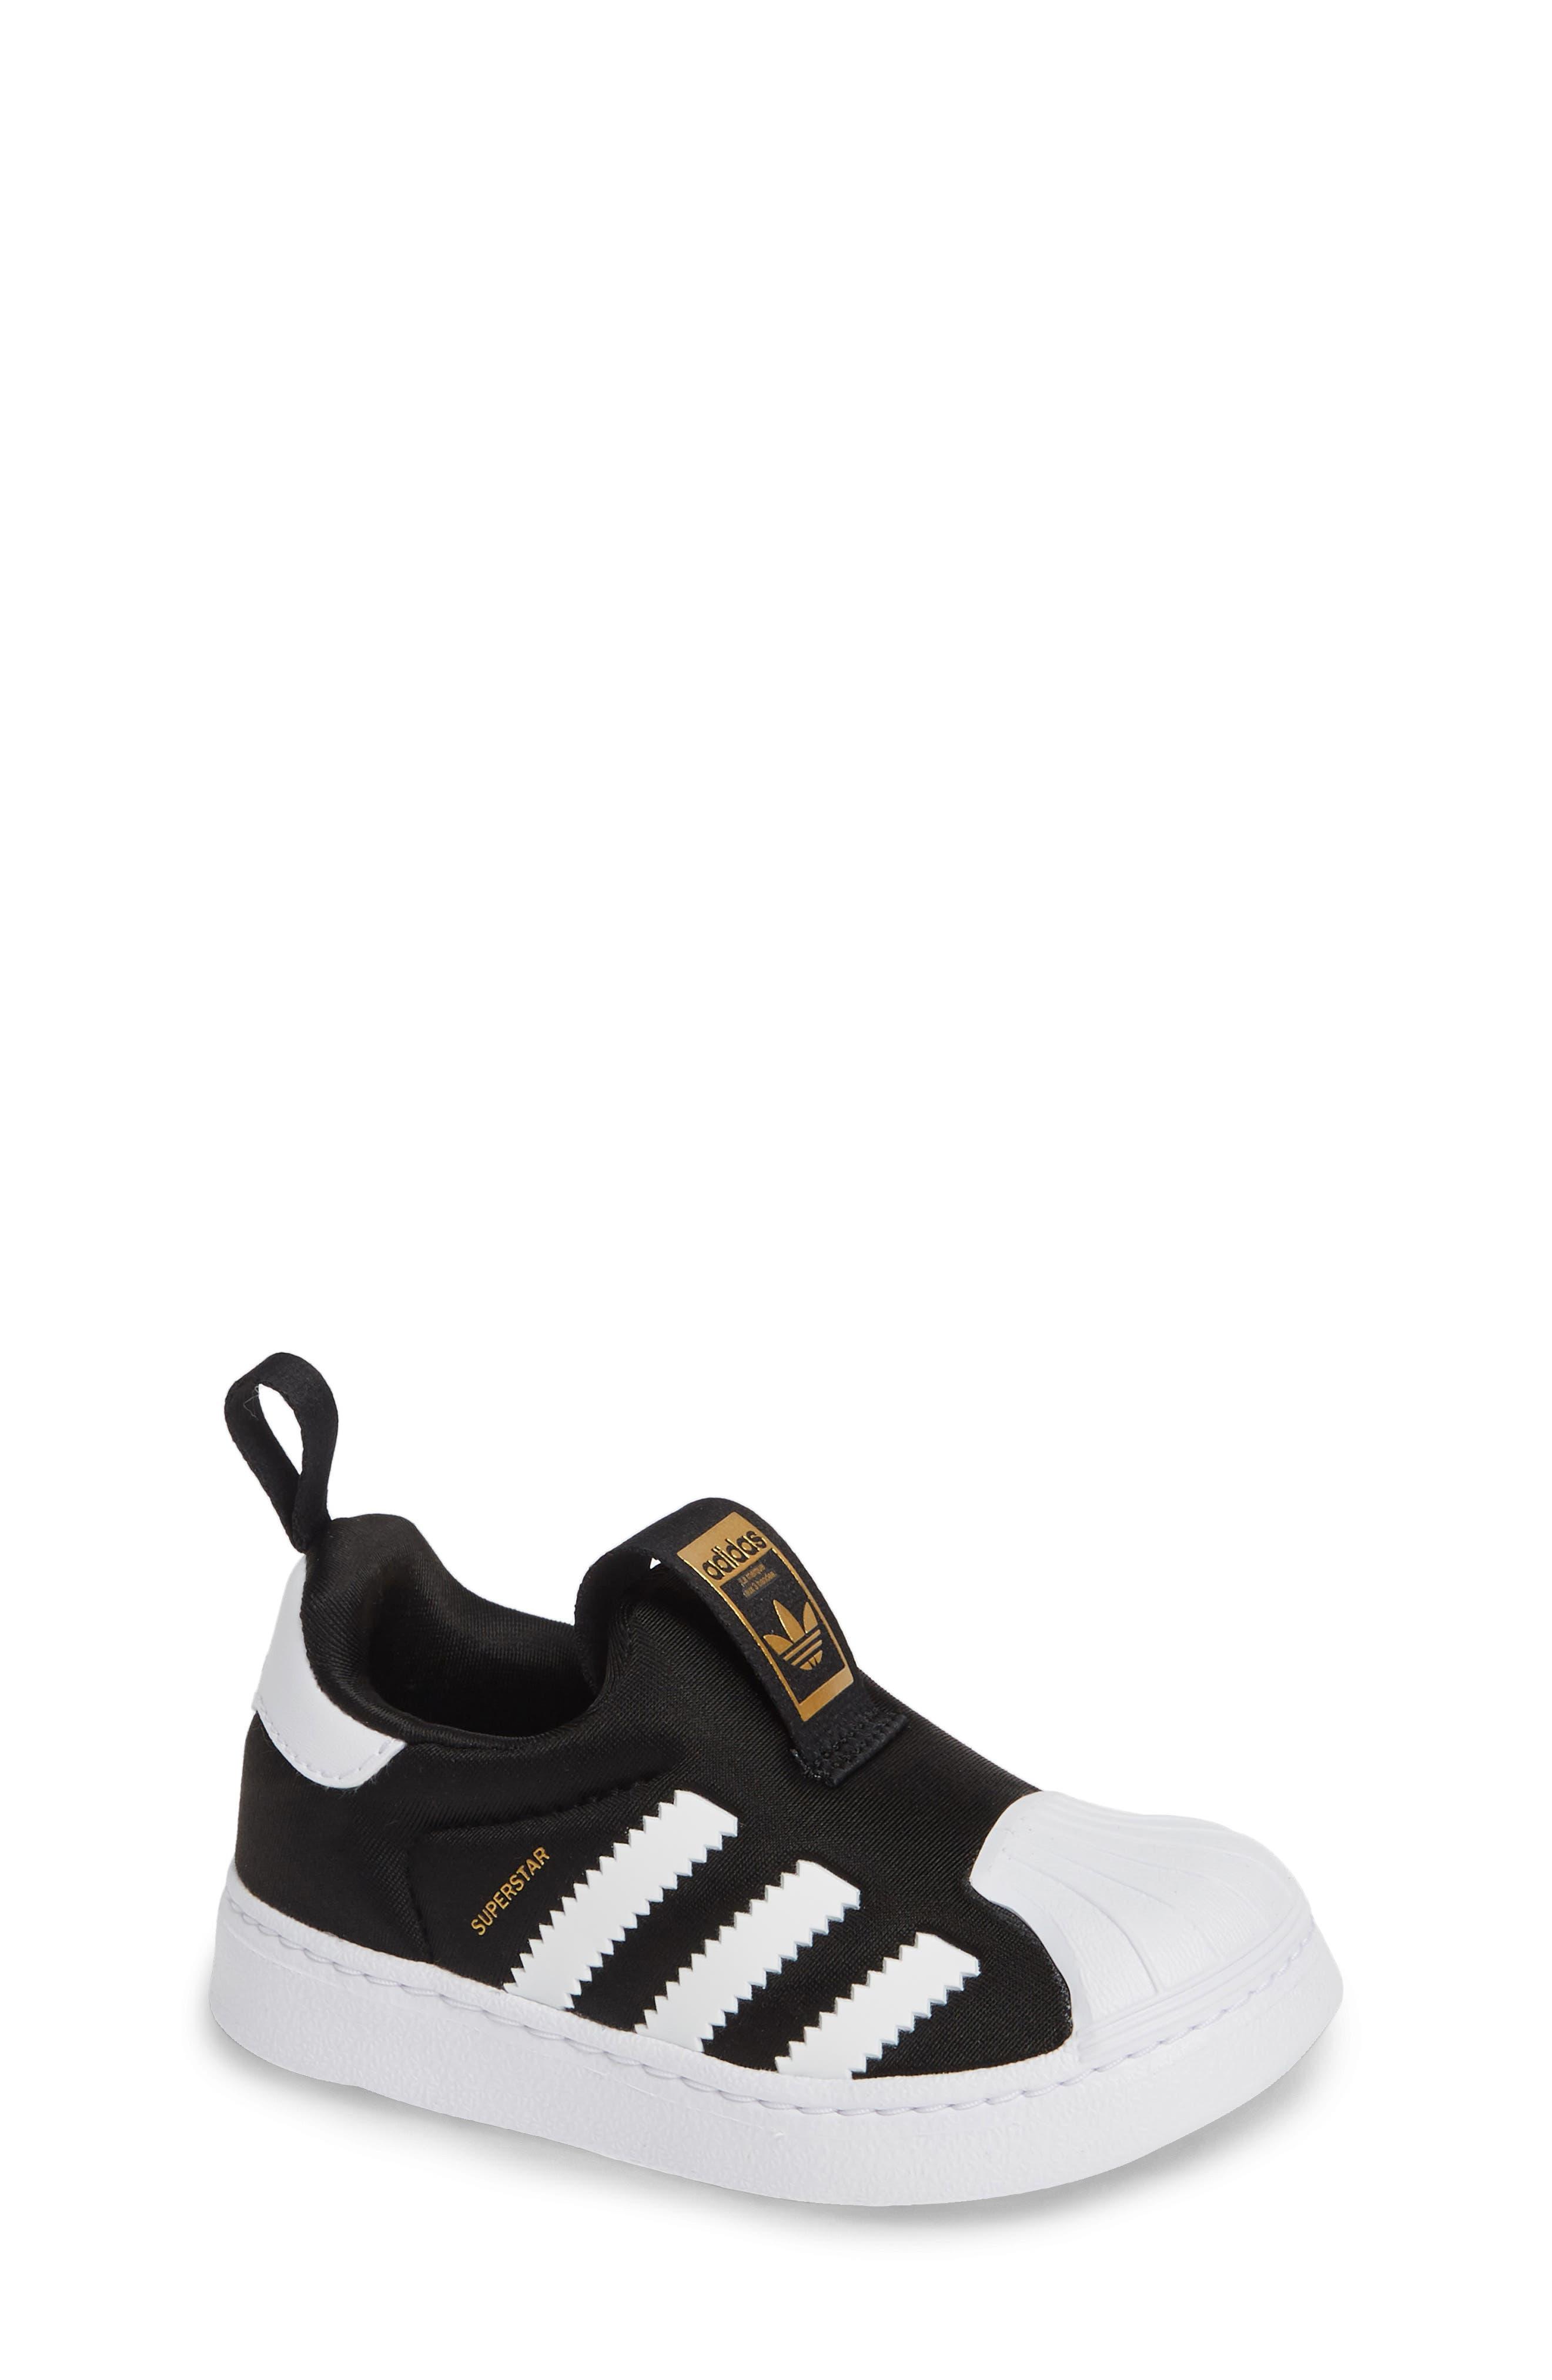 Superstar 360 I Sneaker, Main, color, CORE BLACK/ WHITE/ GOLD MET